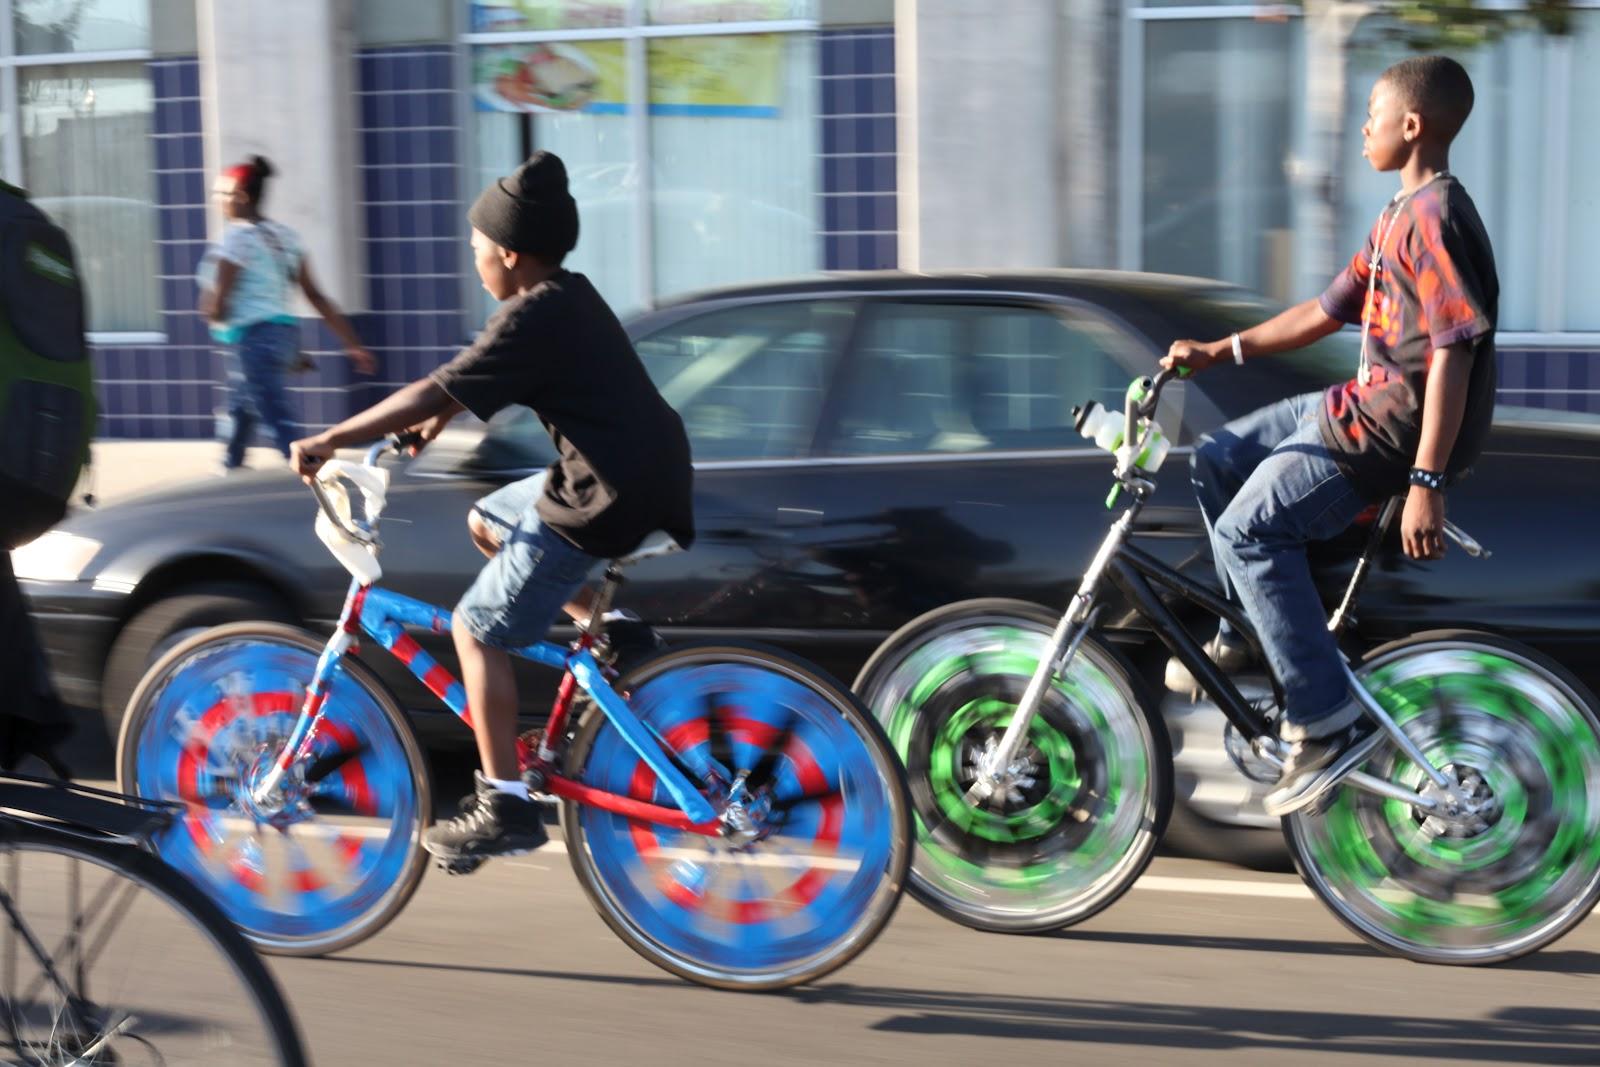 Bikes 4 Life Oakland in Oakland s flatlands